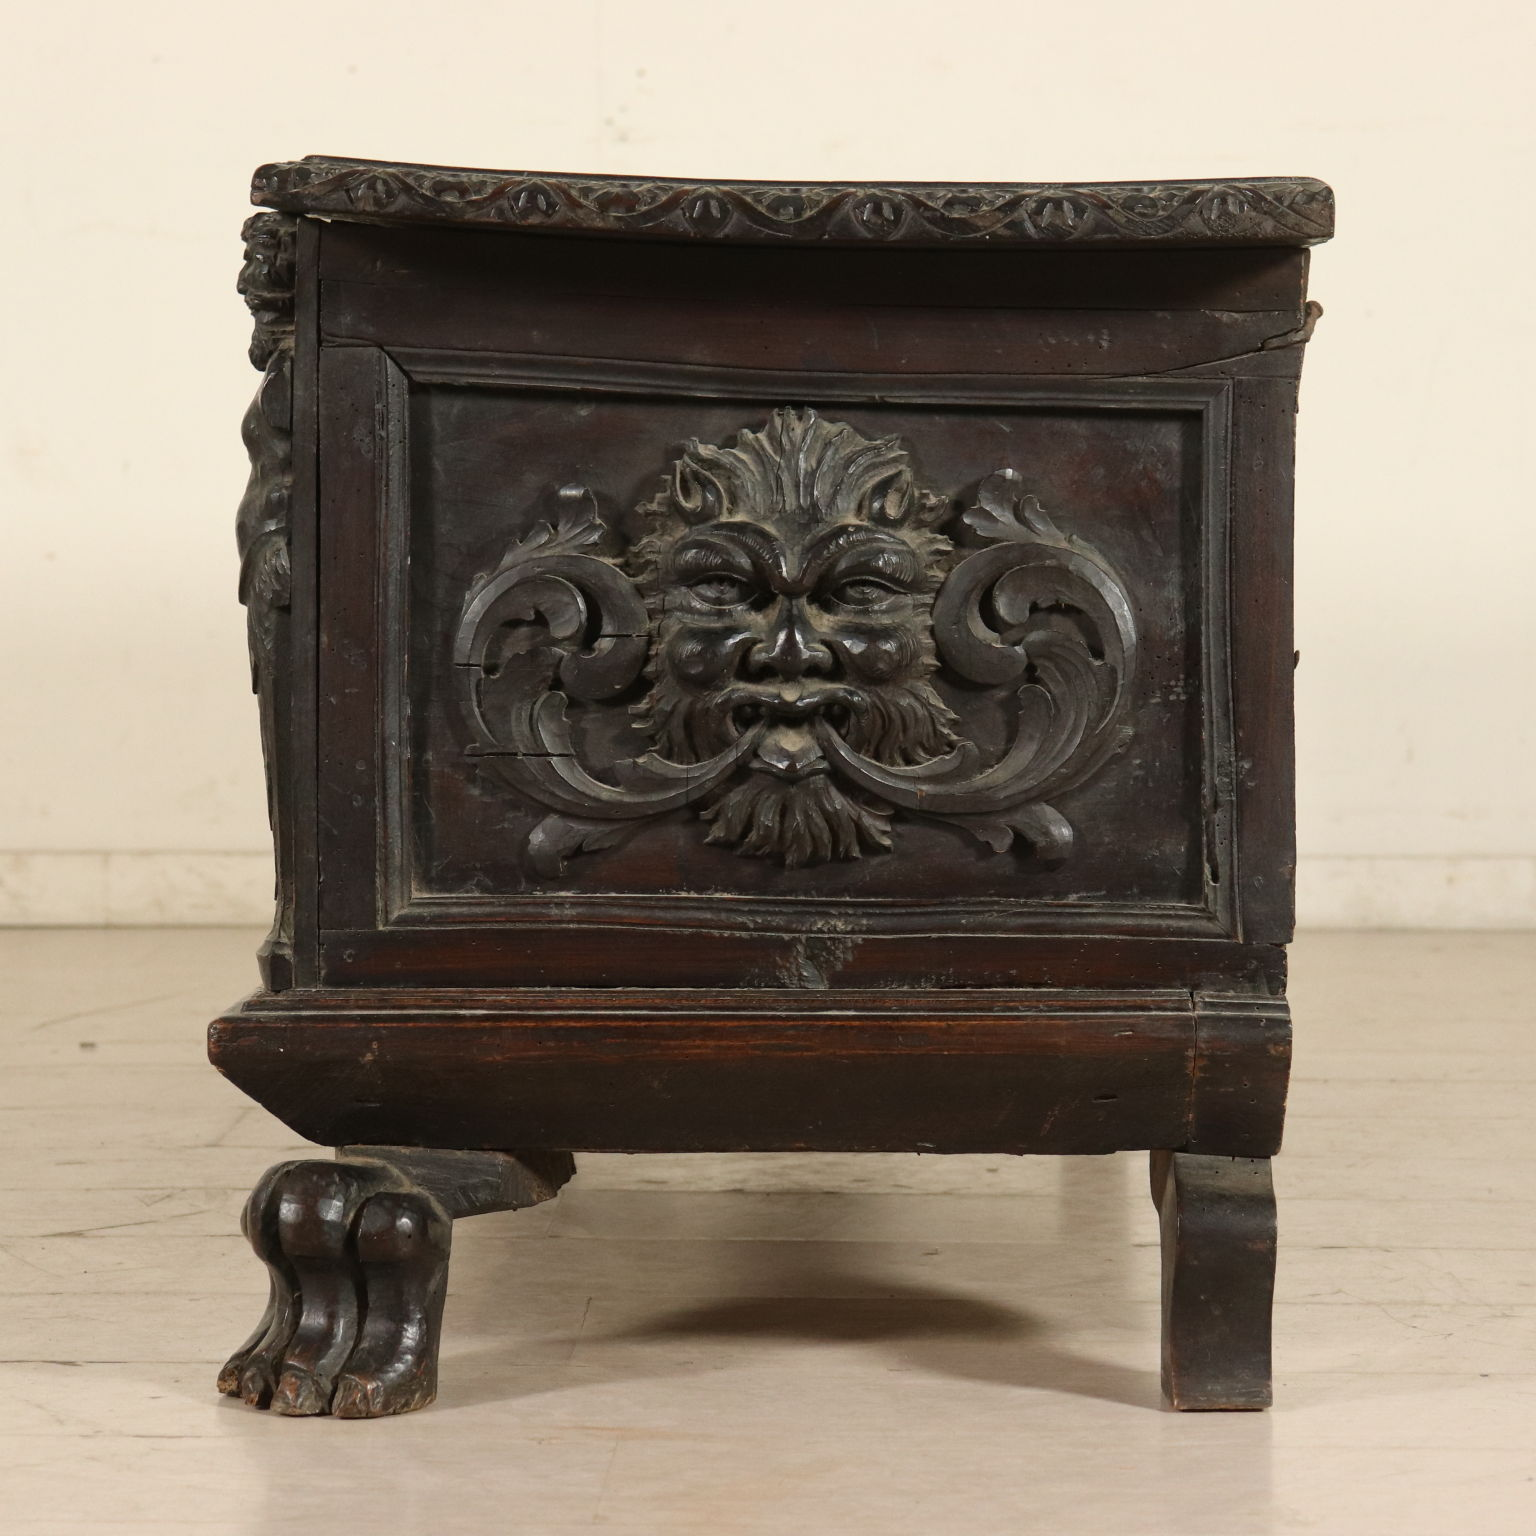 Astounding Walnut Antique Storage Bench Italy Late 1600S Theyellowbook Wood Chair Design Ideas Theyellowbookinfo